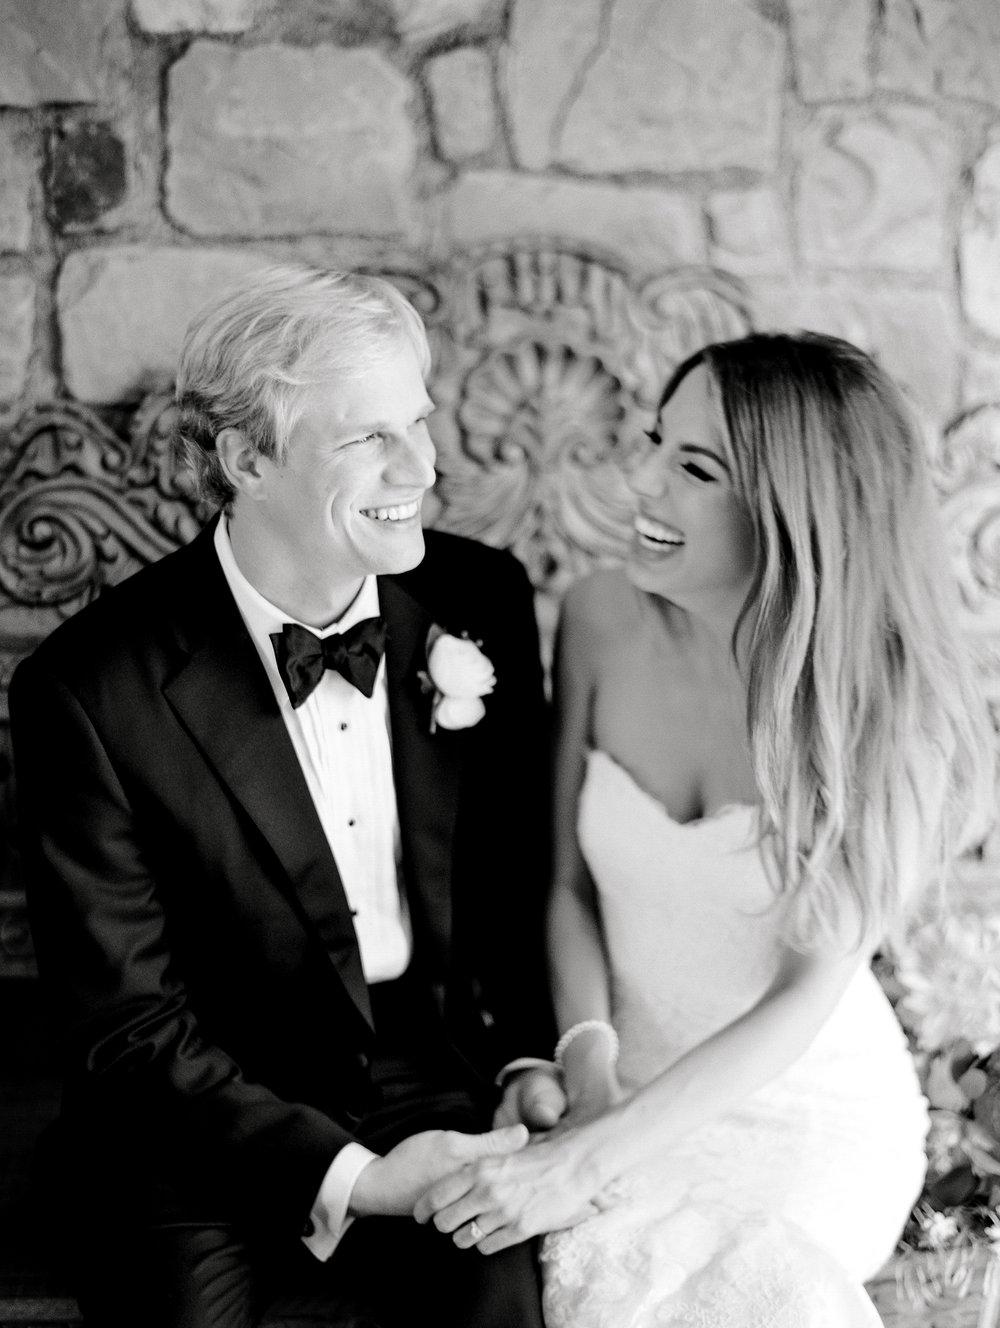 Escondido-Golf_Lake-Club-Hill-Country-Houston-Wedding-Photographer-Best-Top-Luxury-Destination-Engagements-Portrait-Austin-Photography-13.jpg